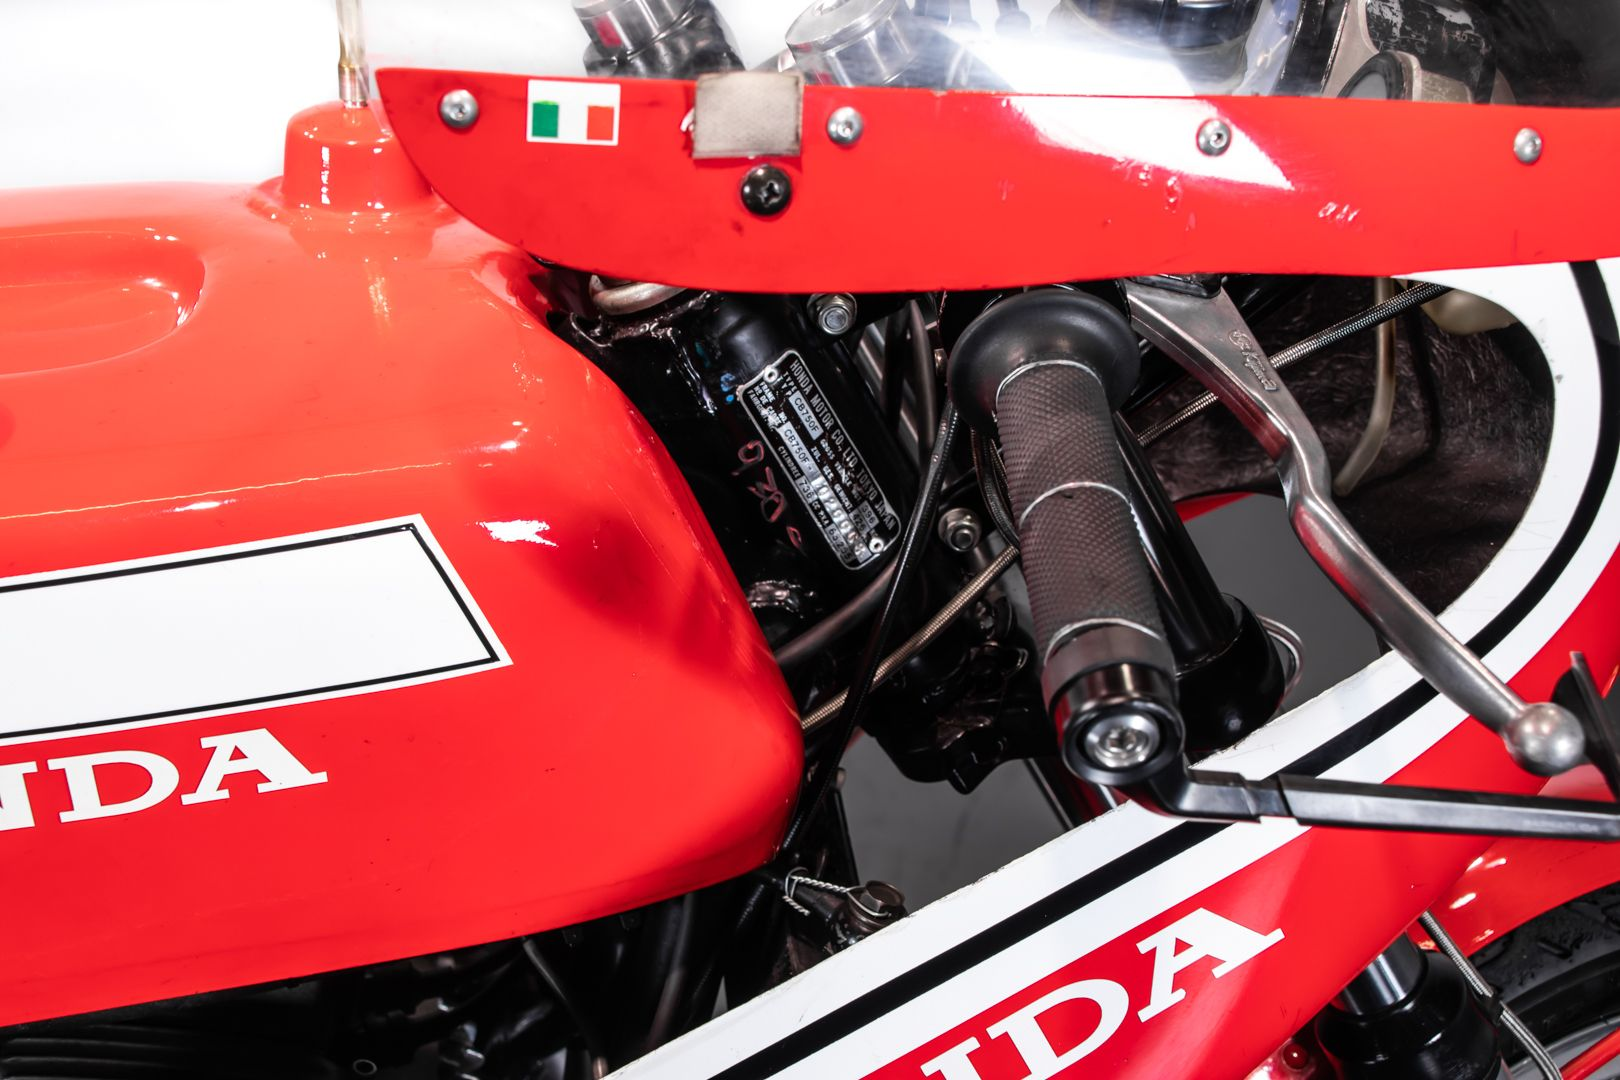 1973 Honda 750 Daytona Replica 72338